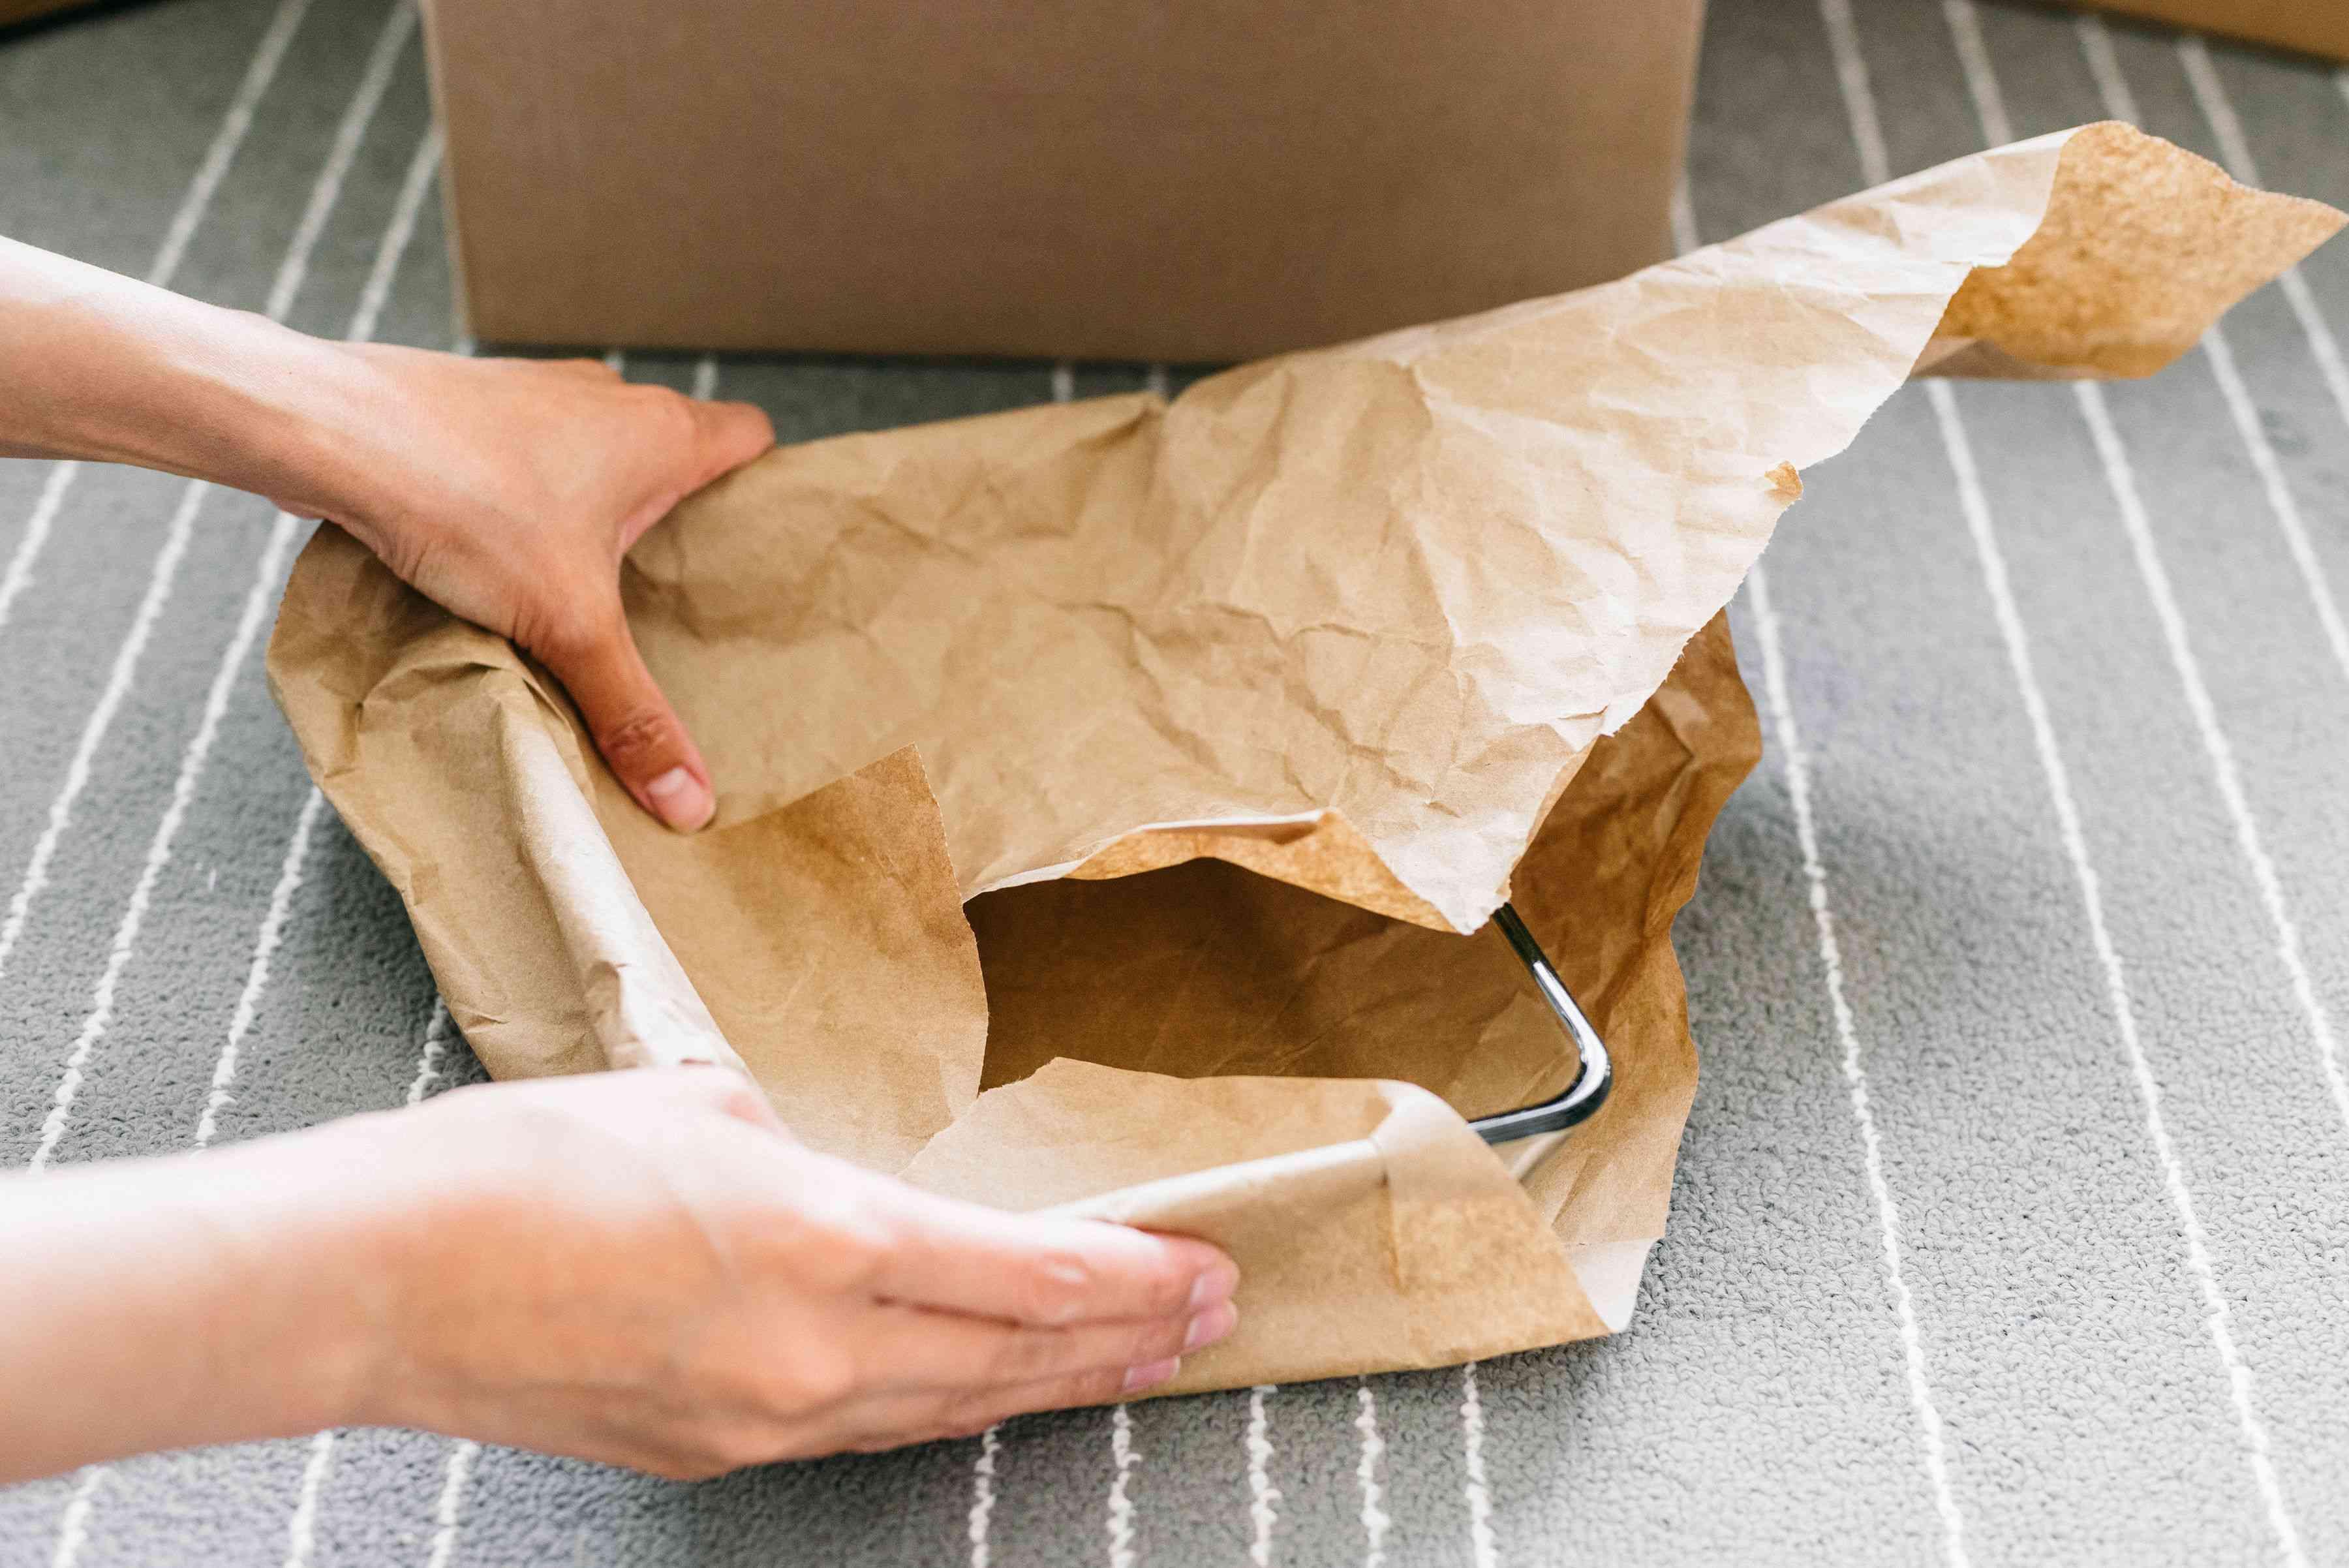 packing fragile glassware